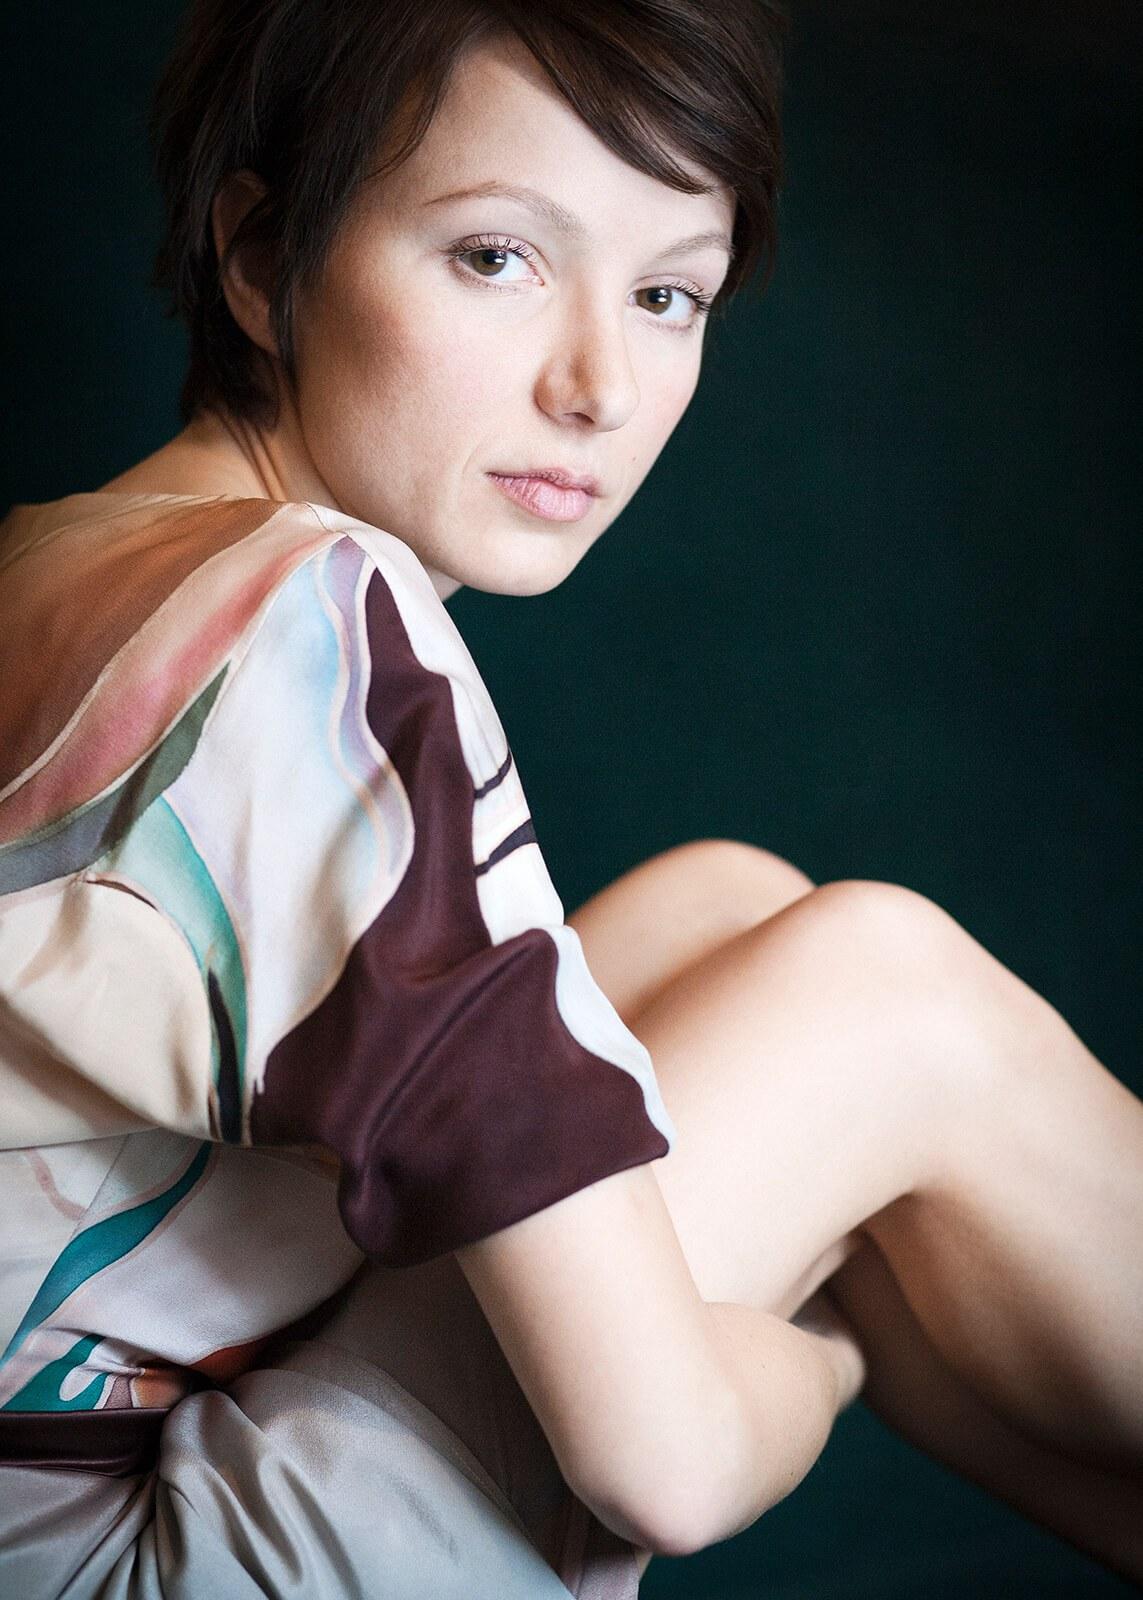 07 Julia Koschitz –